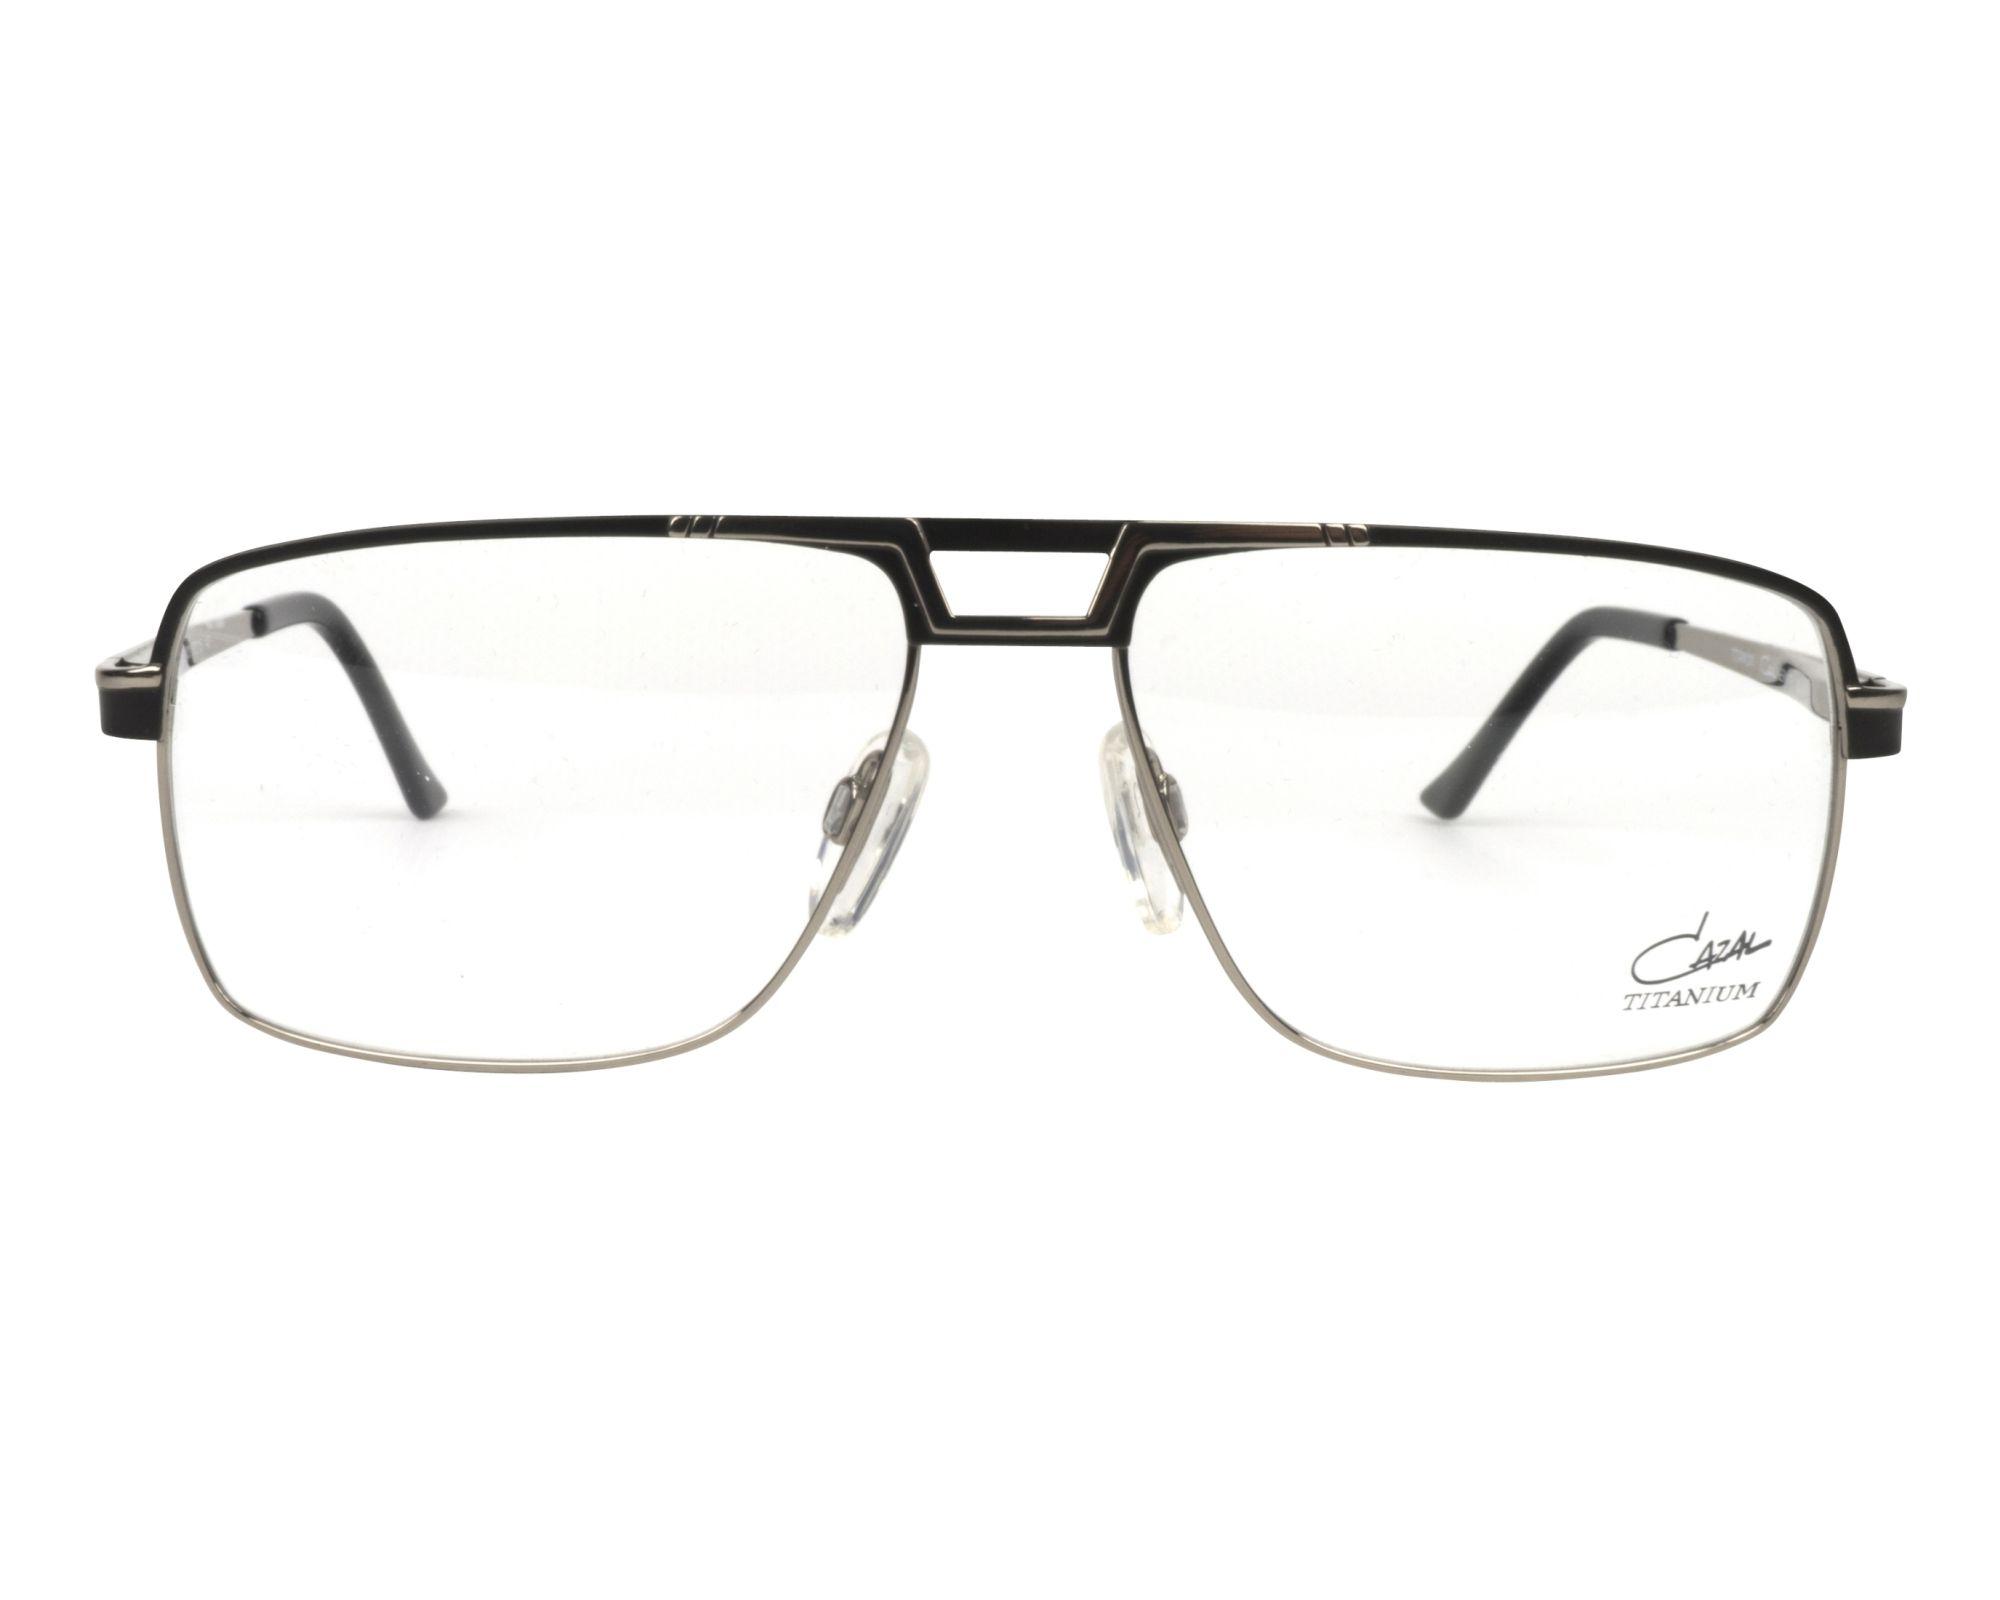 0cb491372a Cazal Titanium Eyeglass Frames Womens 1203 - Bitterroot Public Library